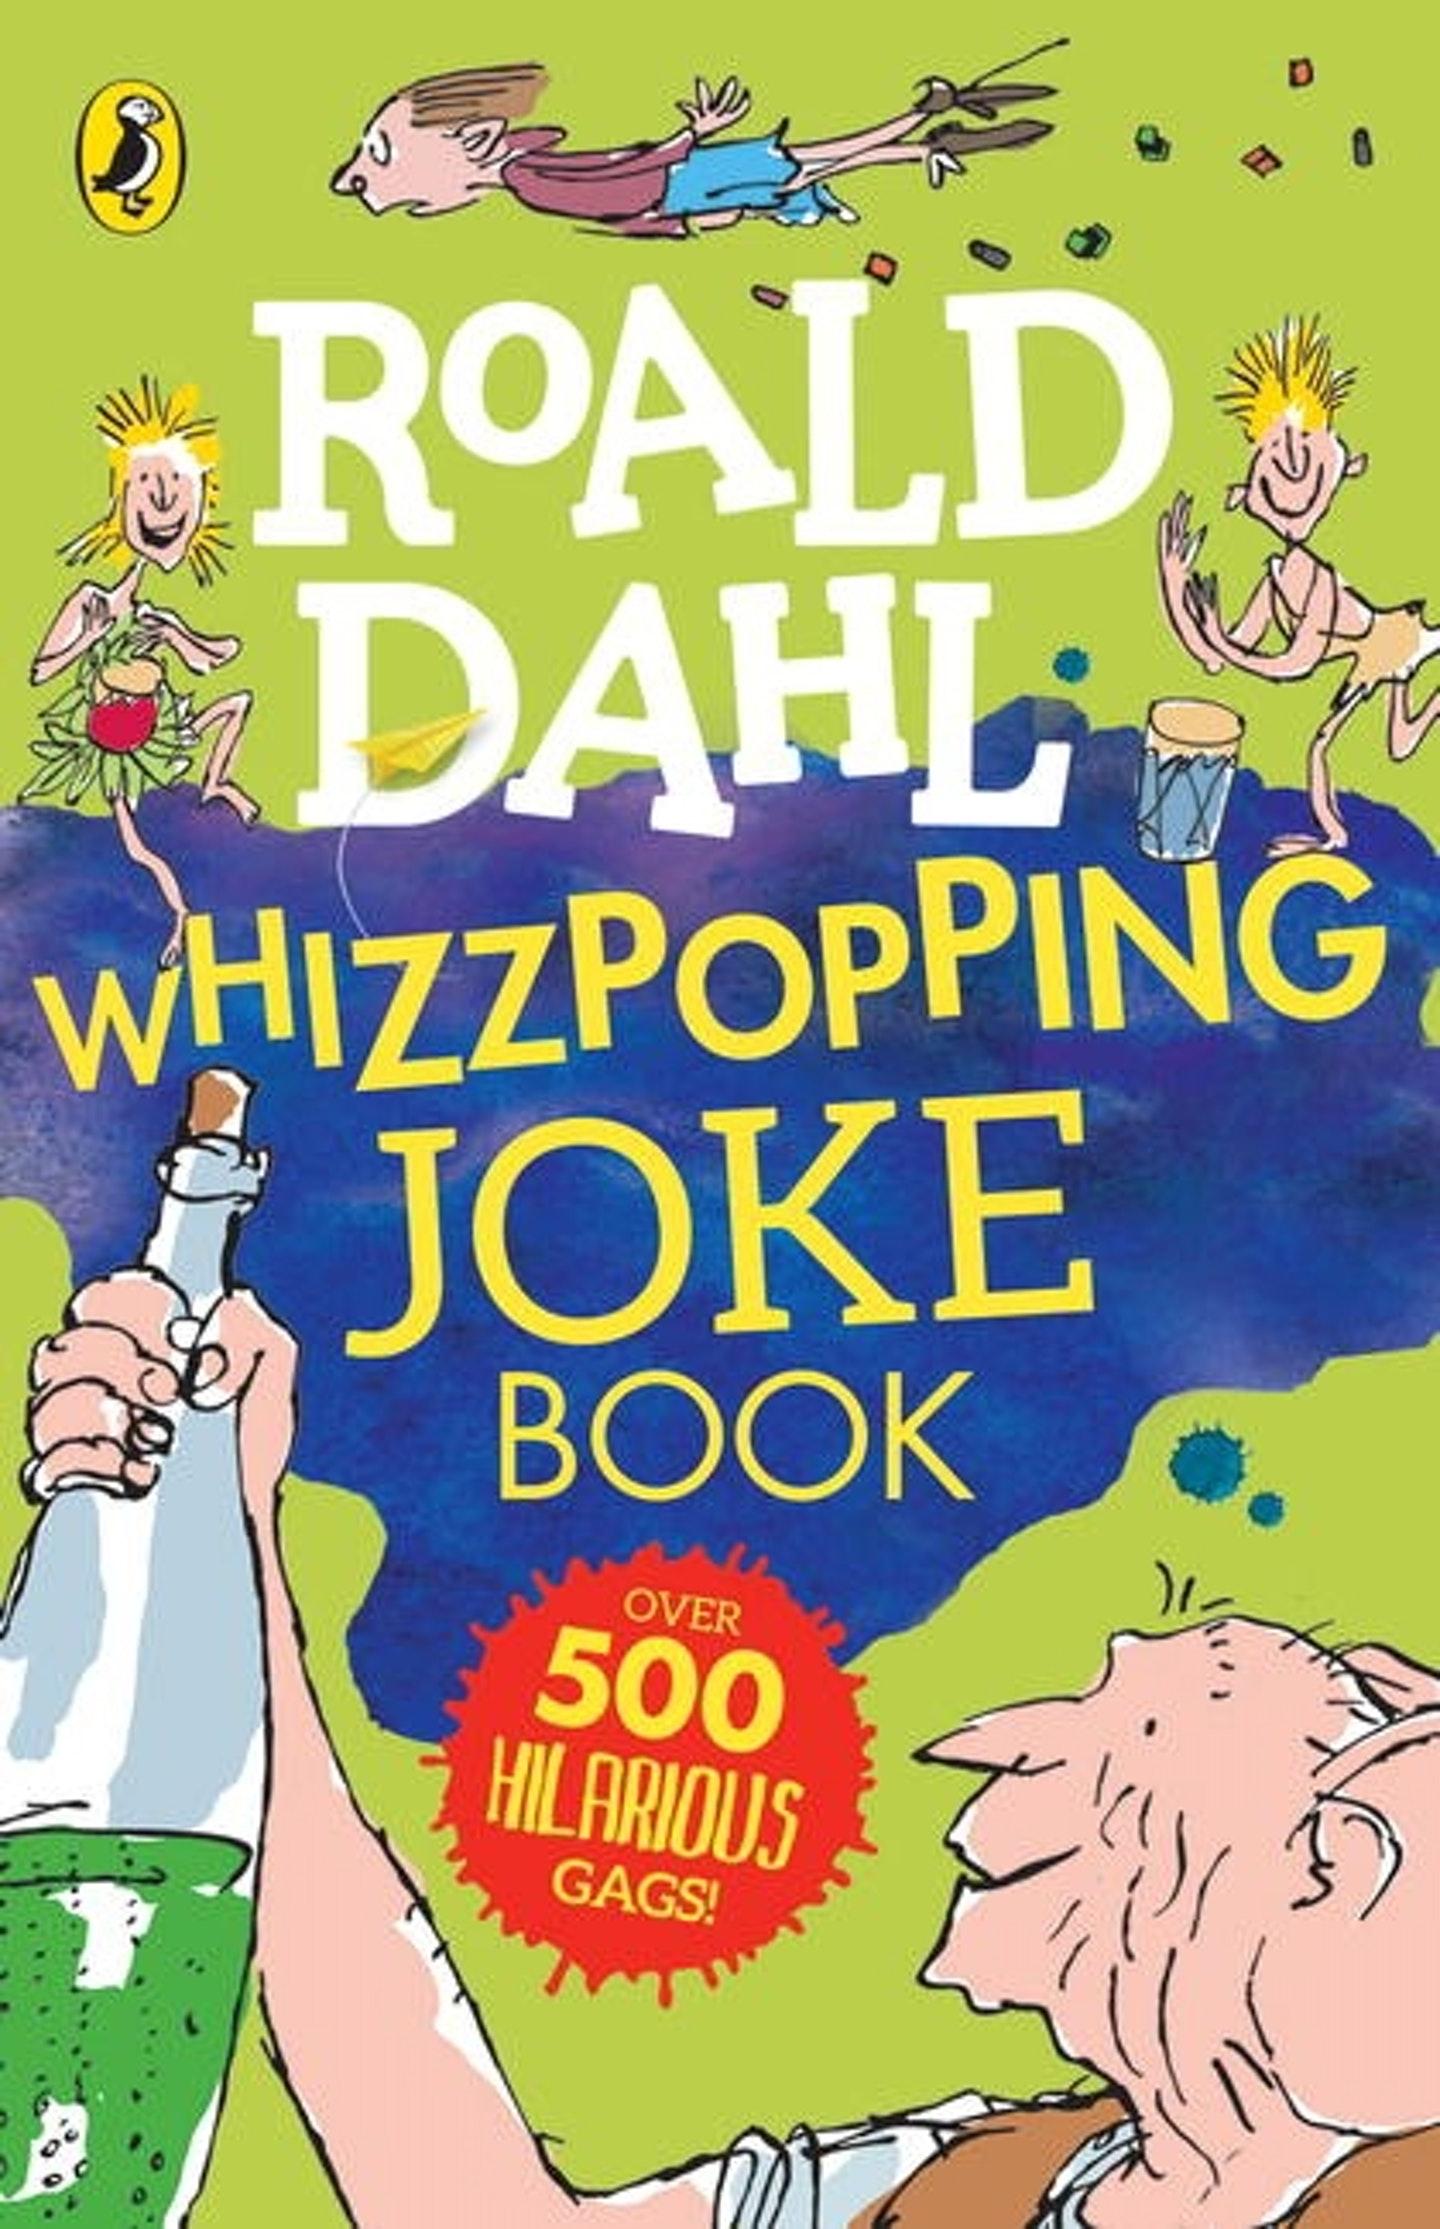 Book Cover Inspiration Jokes : Roald dahl penguin books new zealand